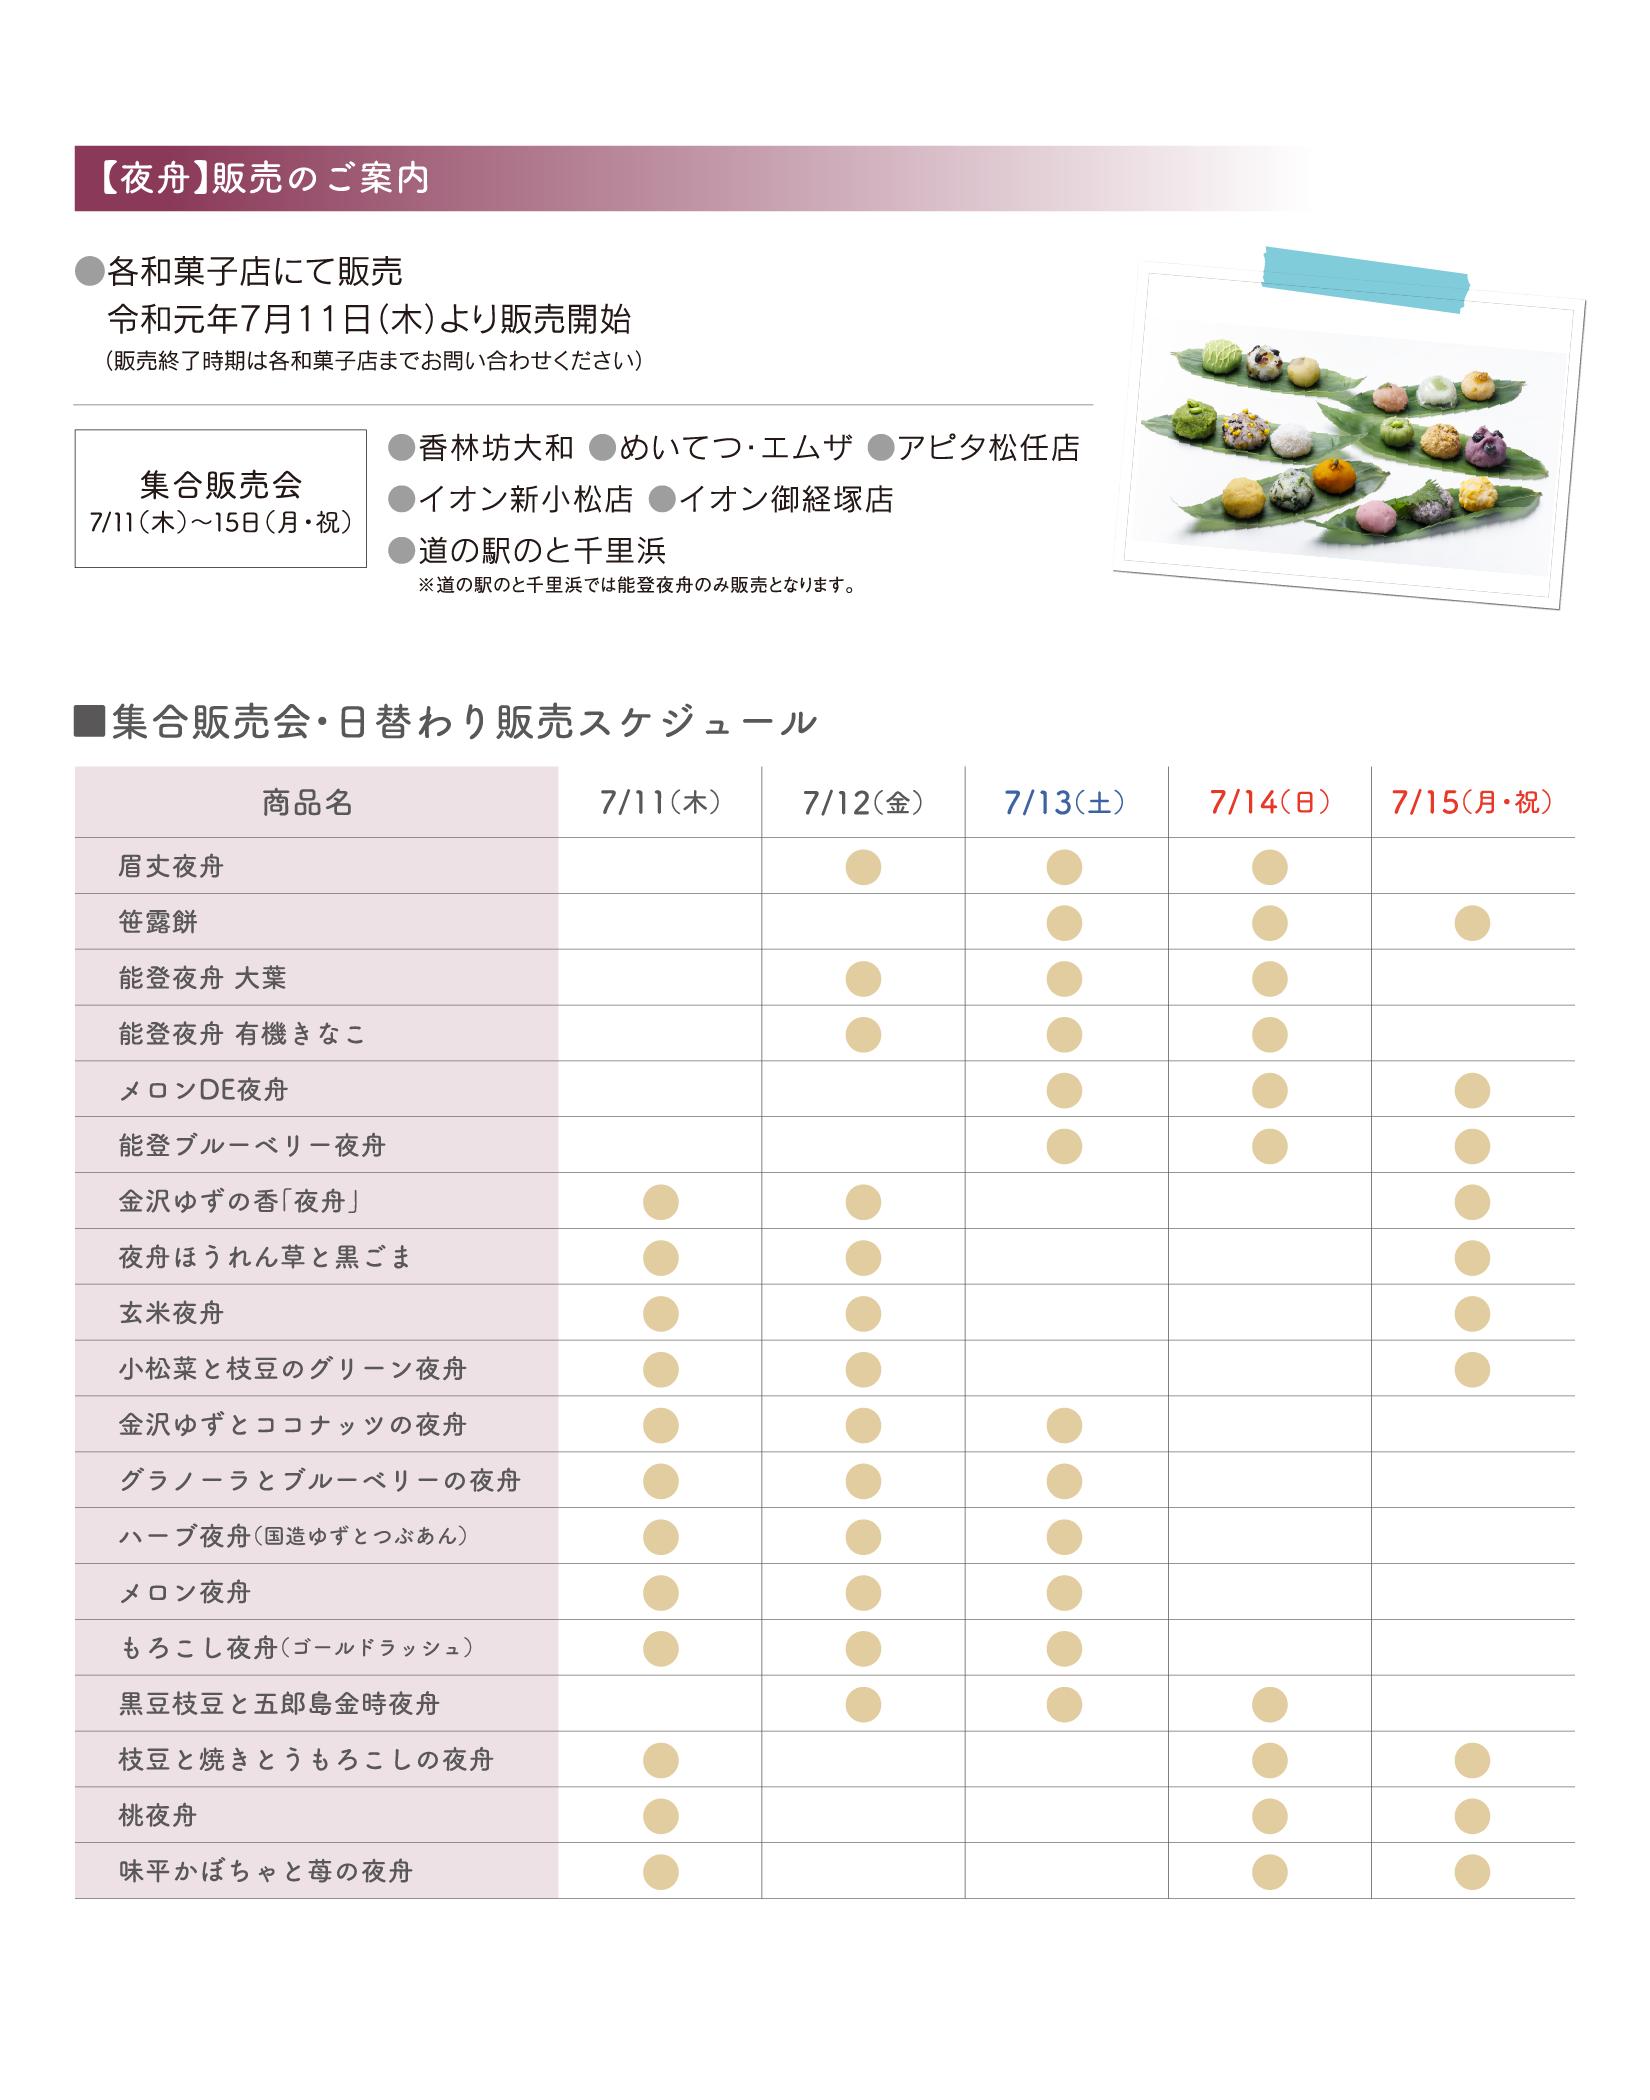 yofune_schedule0708